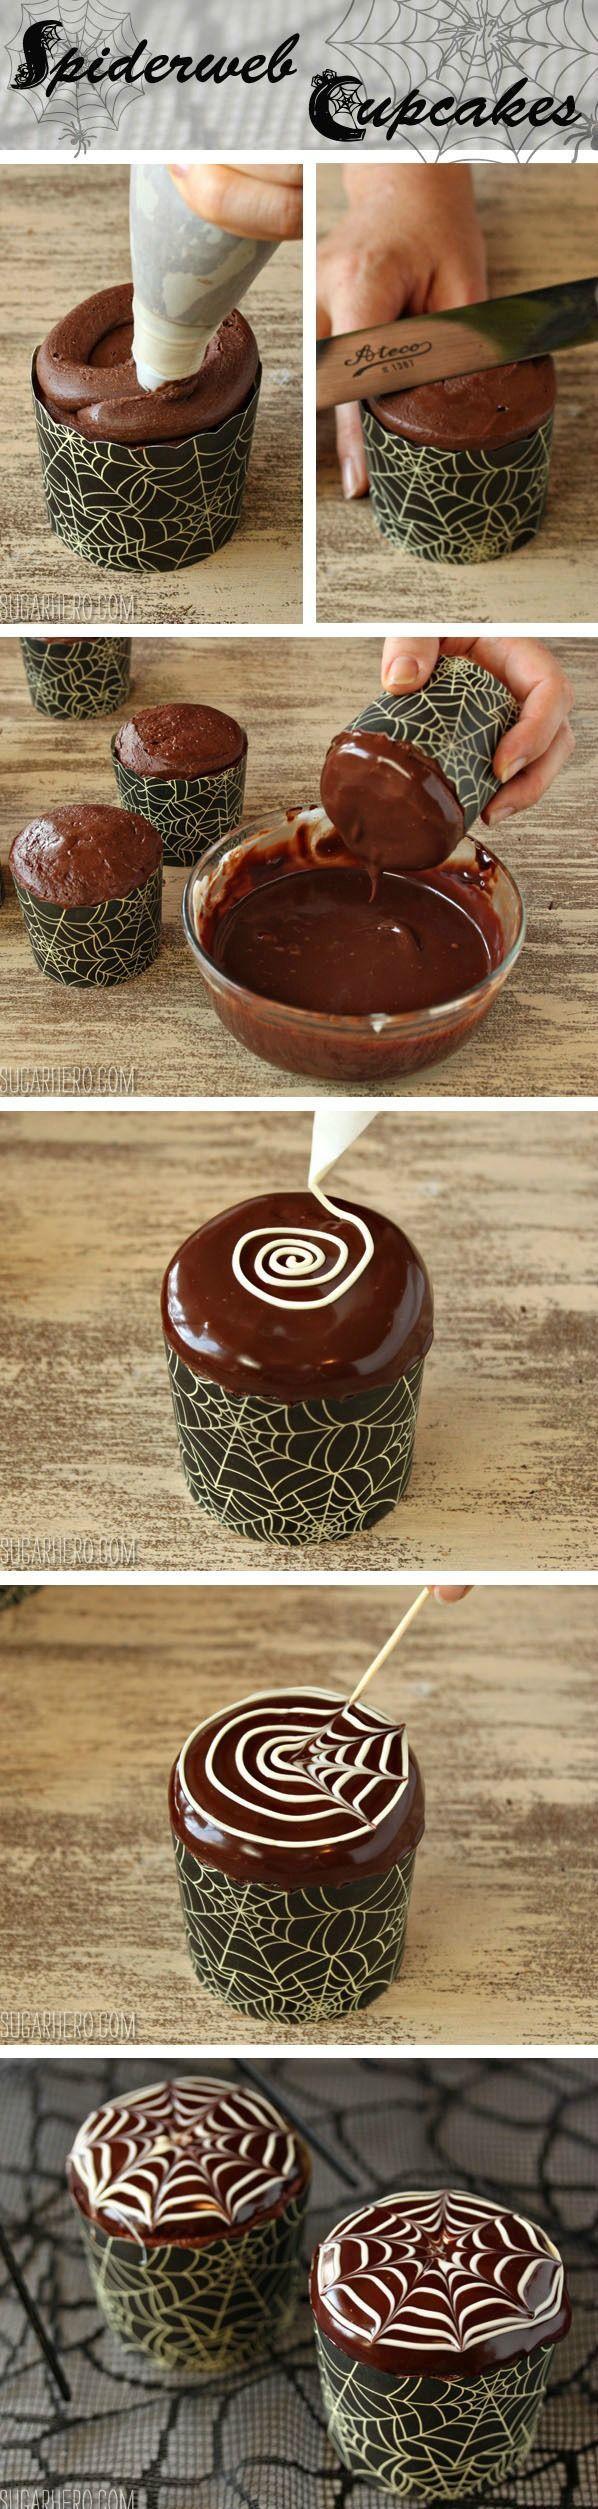 How to make easy spiderweb cupcakes | From SugarHero.com  #HalloweenFood #Family #ShermanFinancialGroup